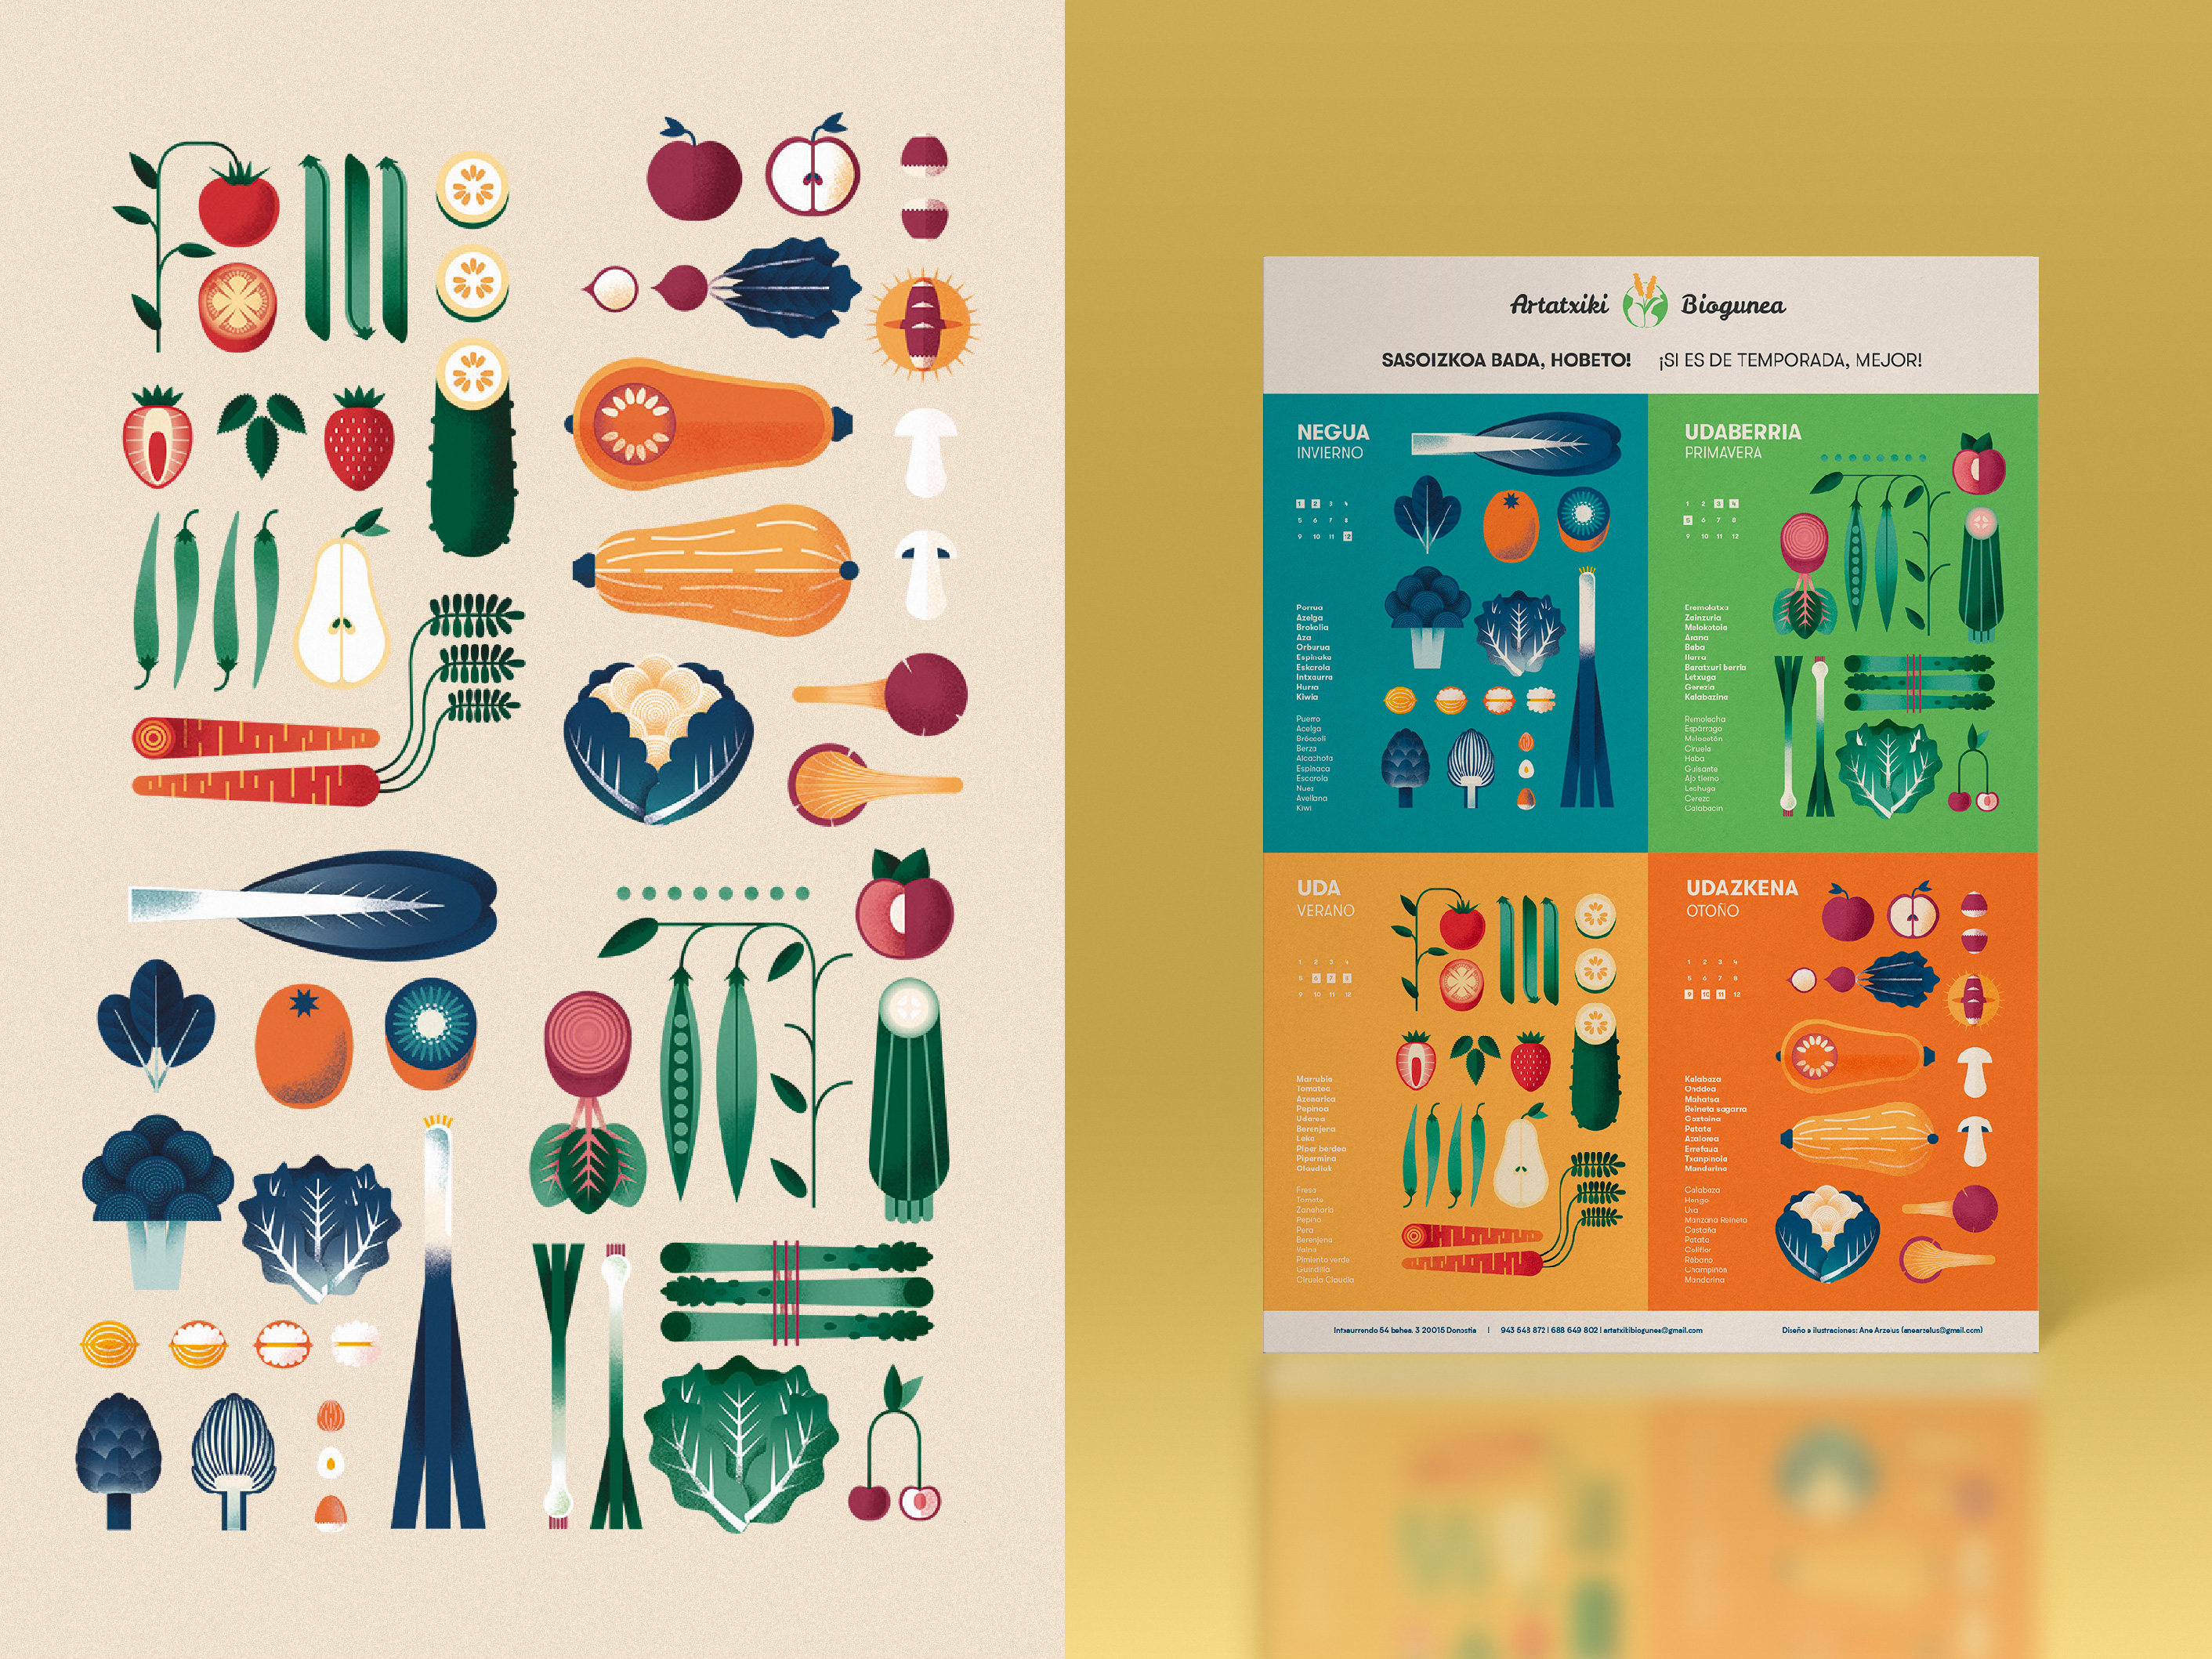 Mini-campaña para Artatxiki by Ane Arzelus - Creative Work - $i